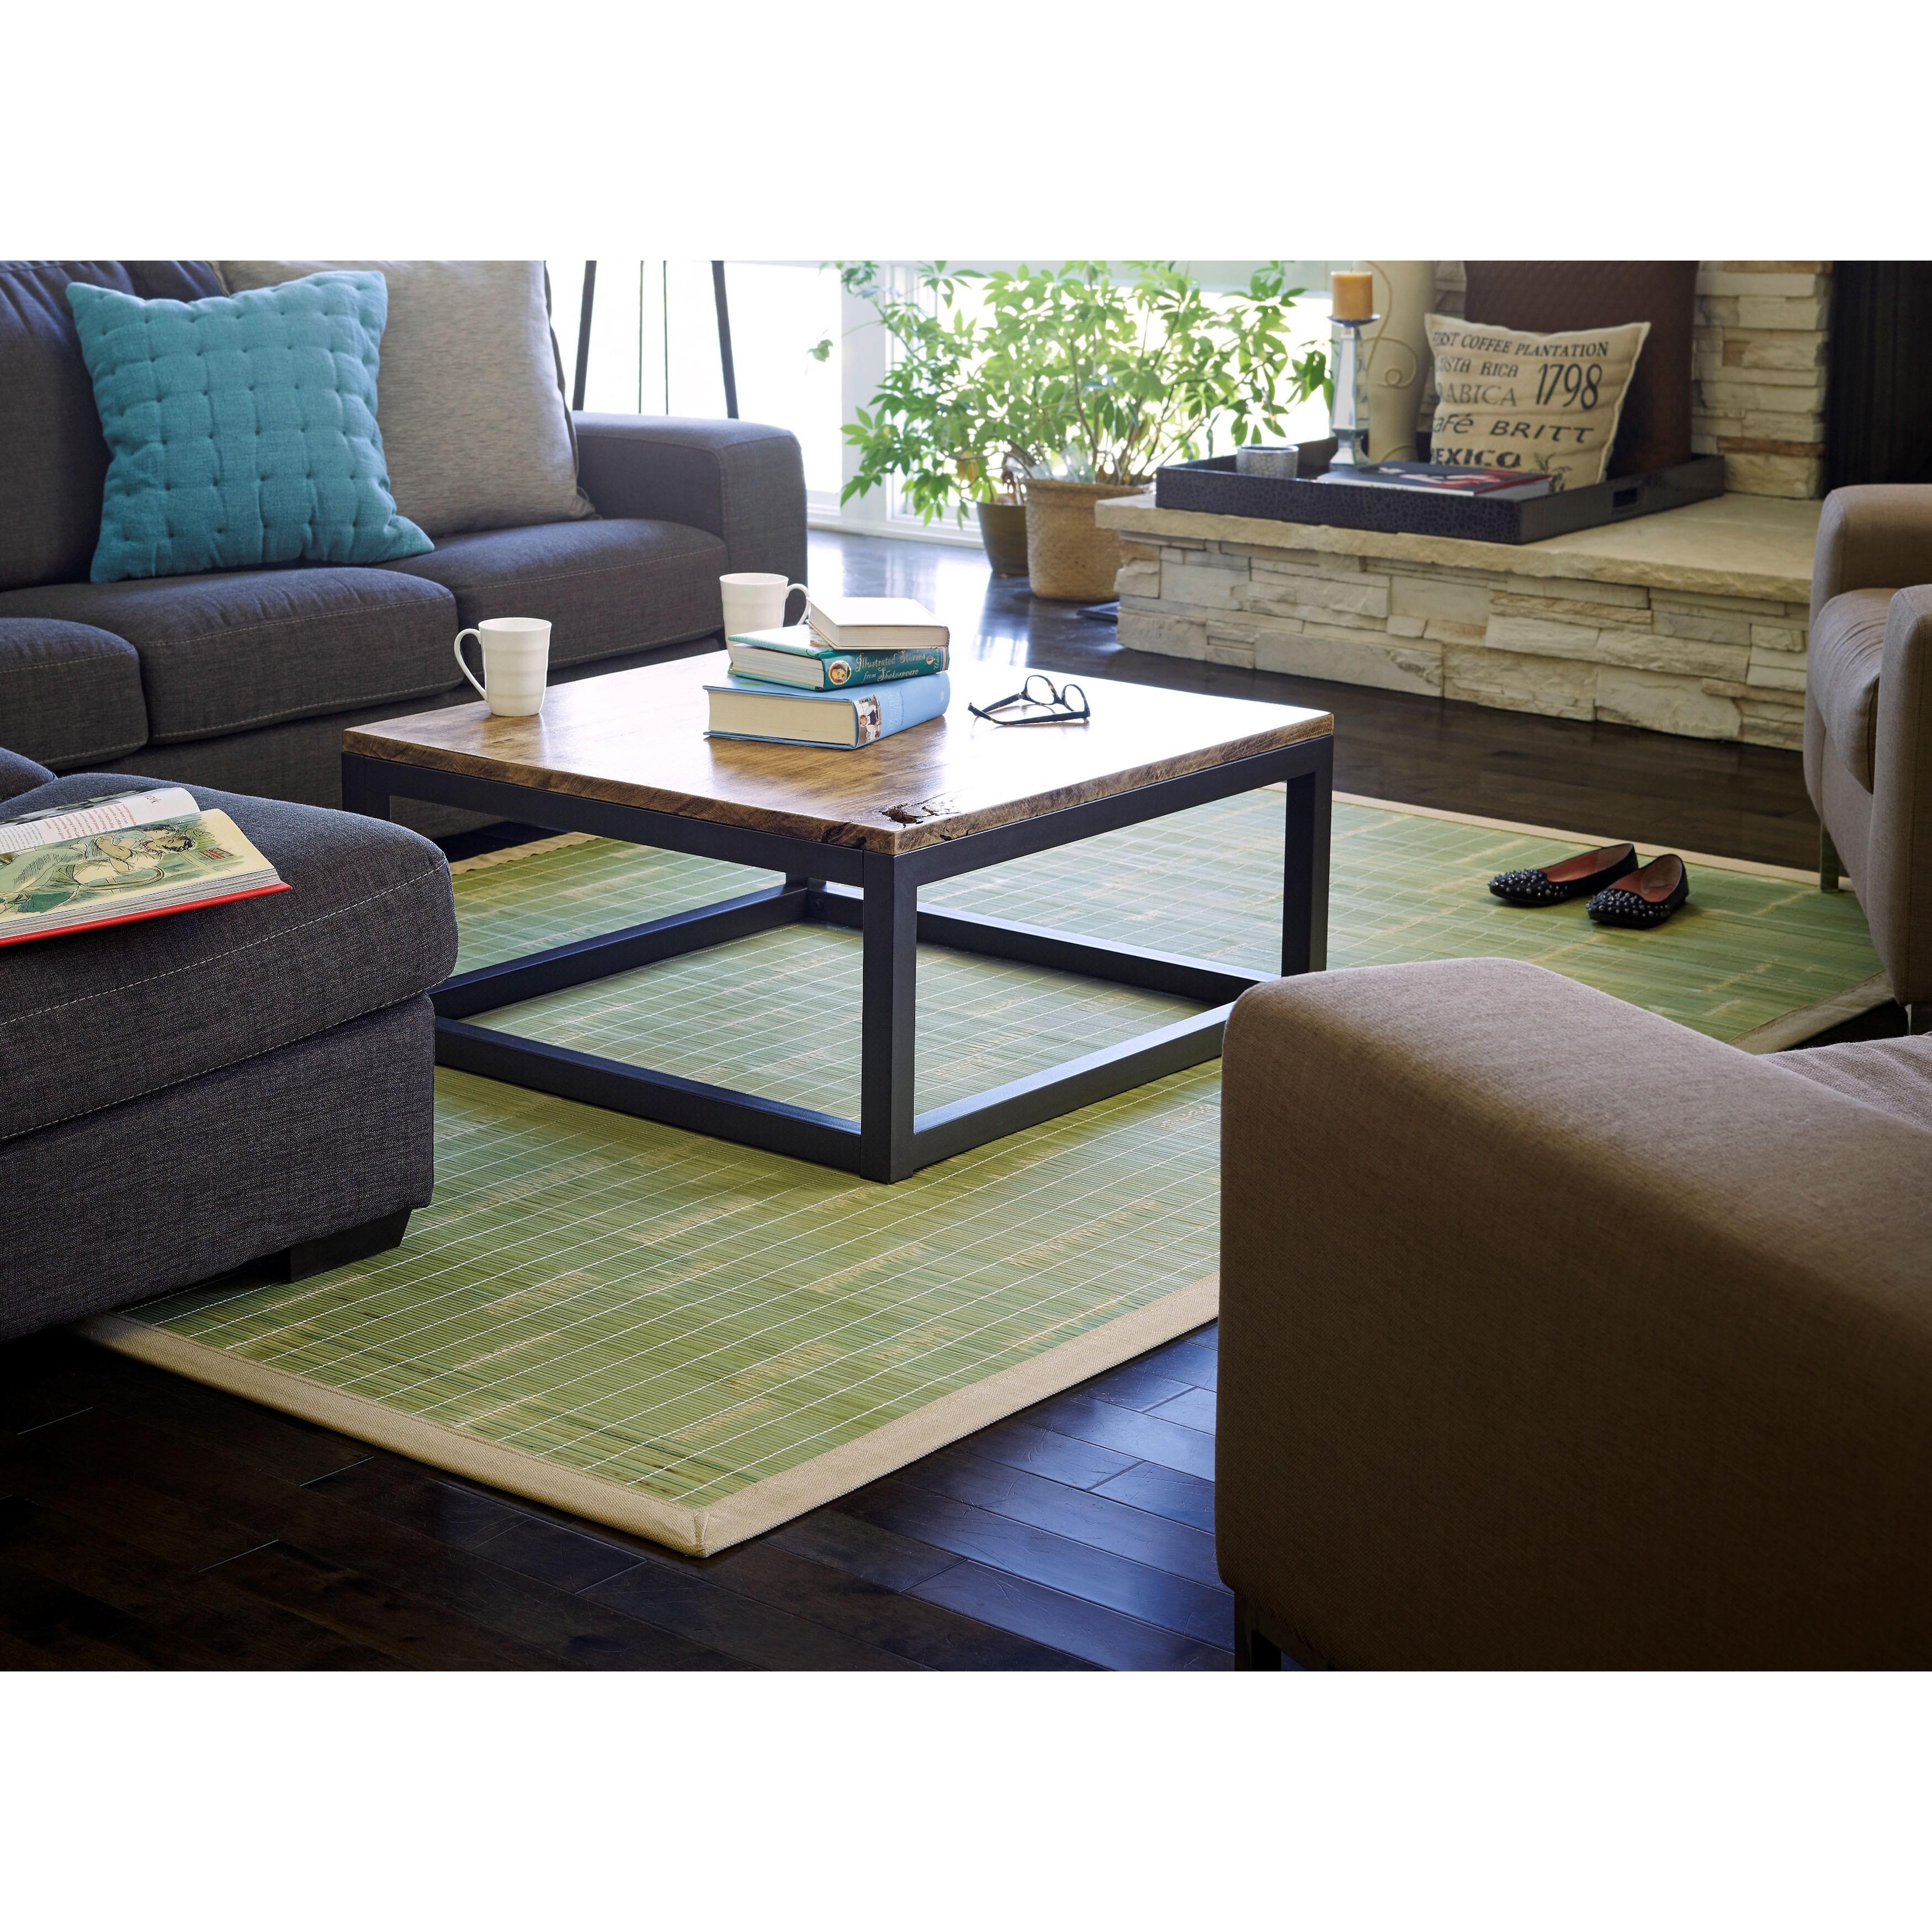 Jani Citroen Green Bamboo Tan Border Area Rug (4' x 6'), ...